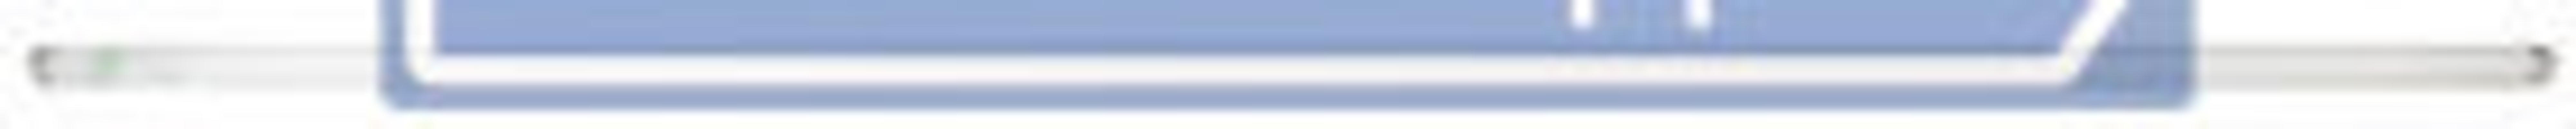 OSRAM LOISTEPUTKI 58W/827 FLH1 G13